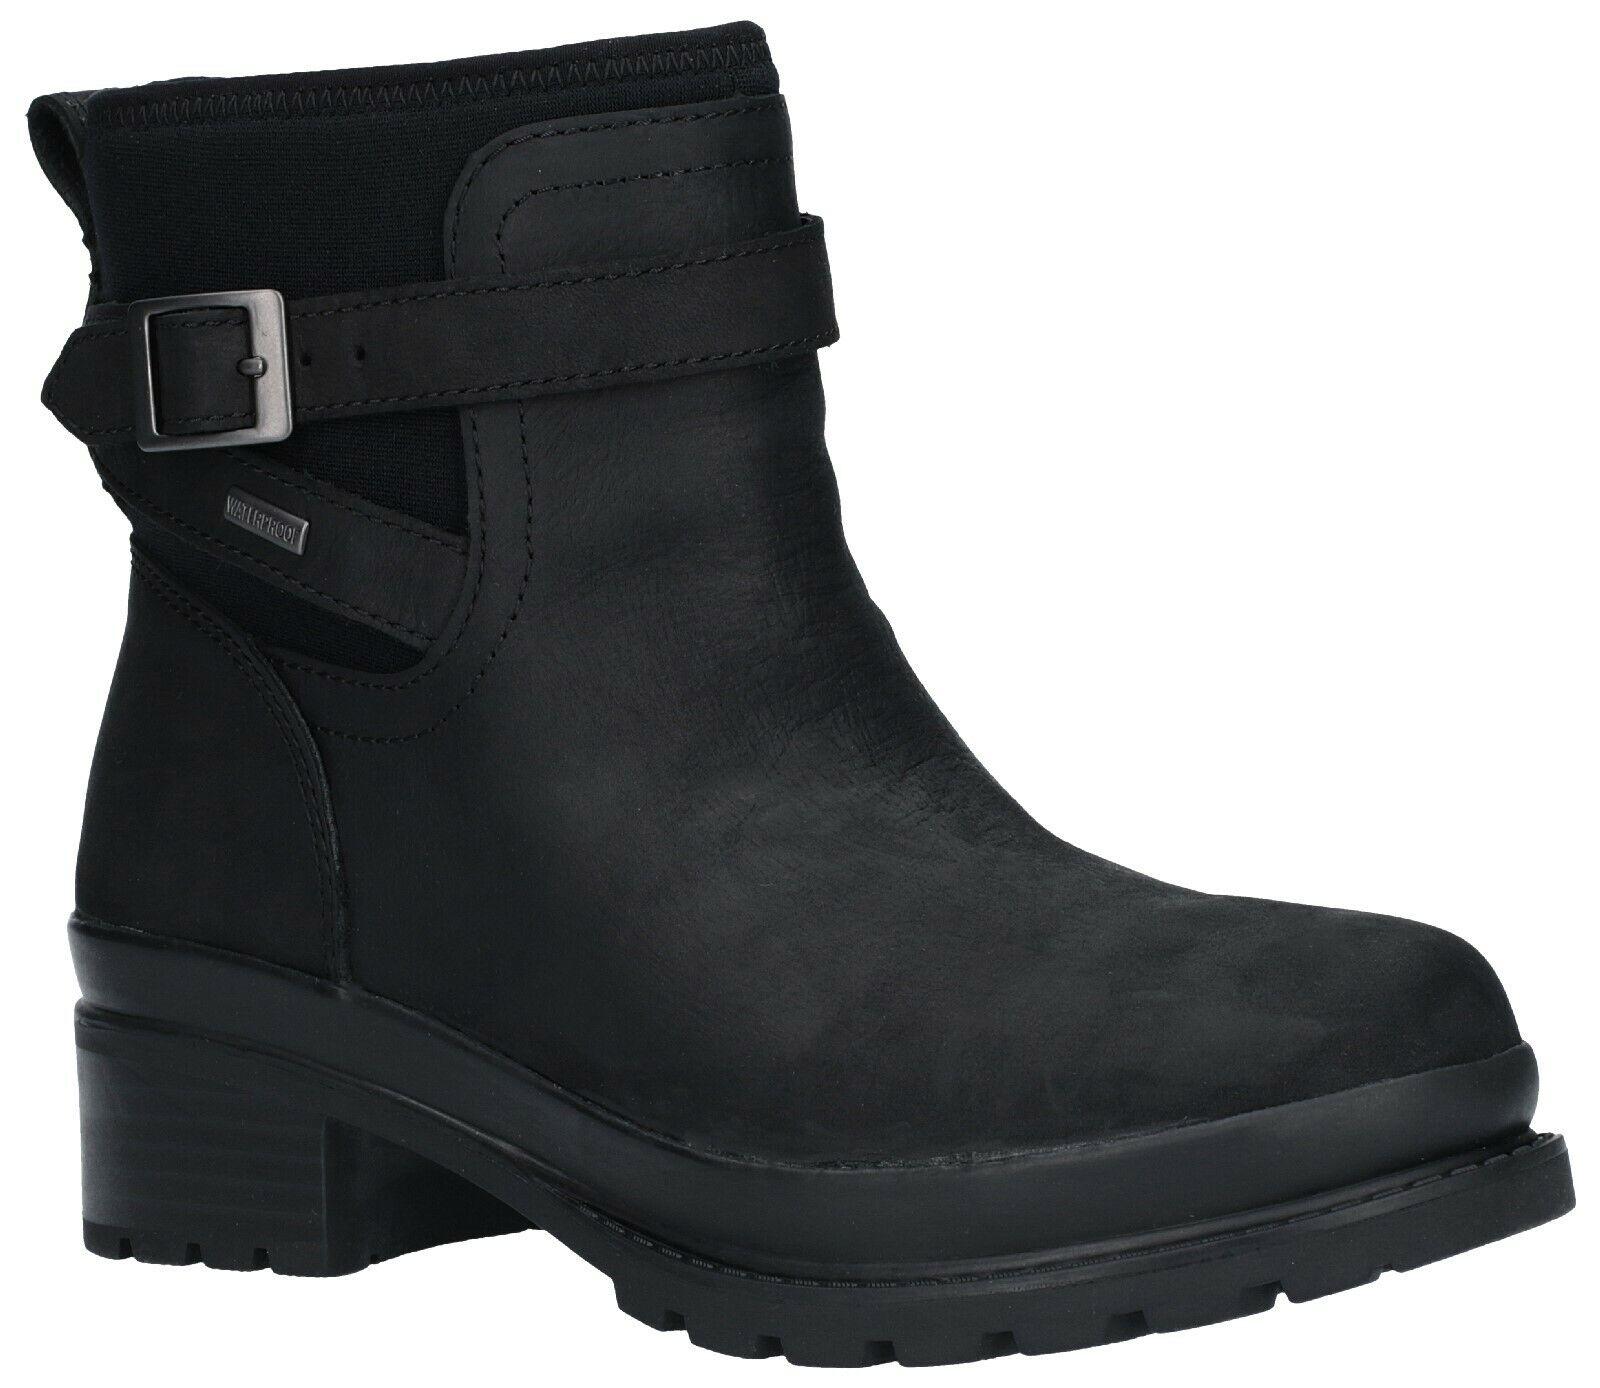 Muck Stiefel Liberty schwarz waterproof leather slip-on ankle Stiefel